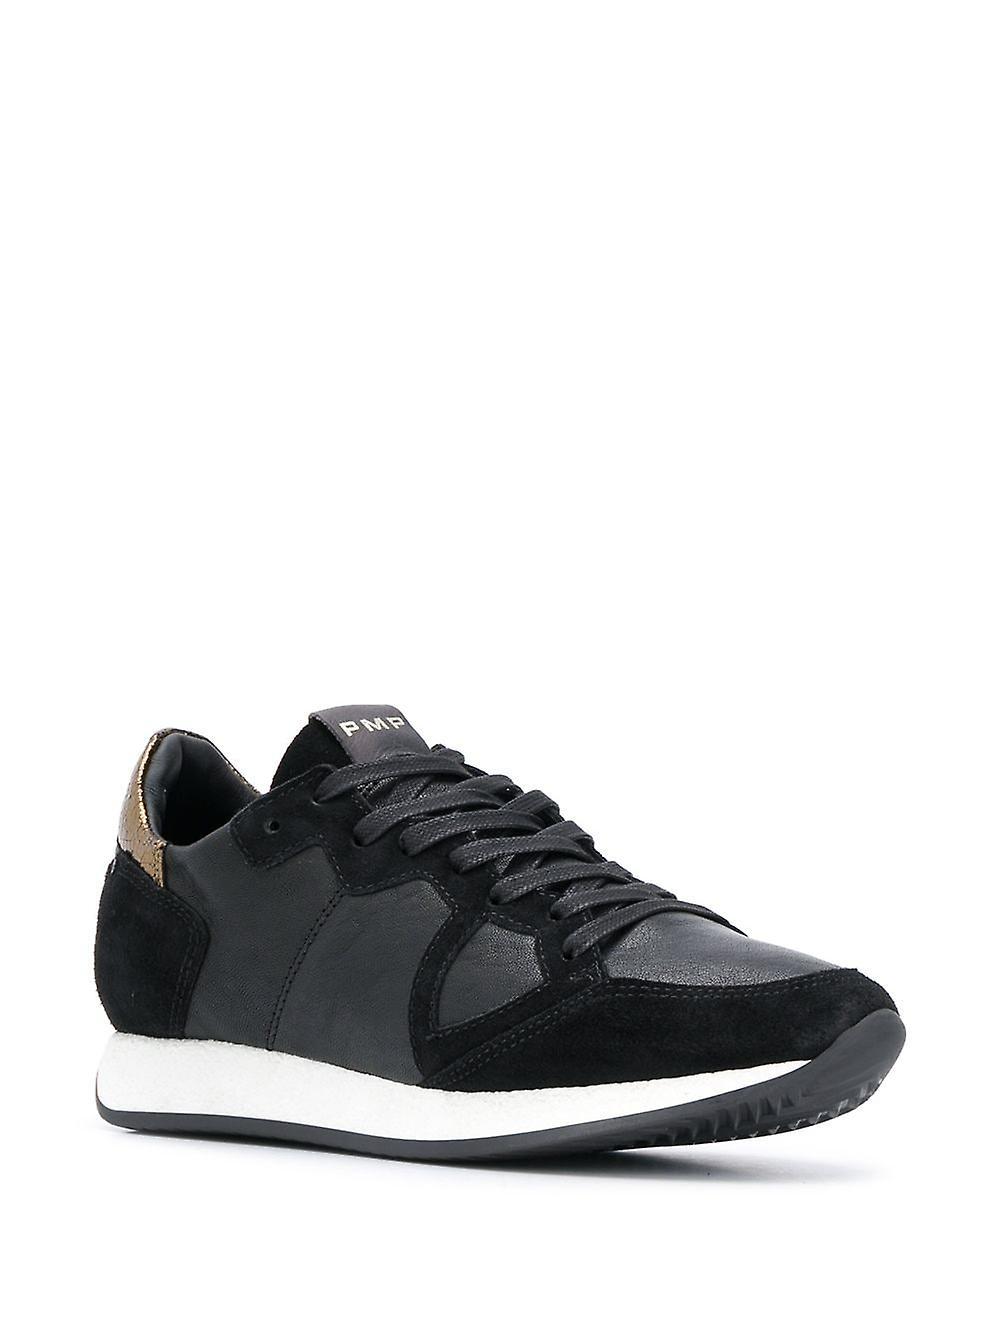 Philippe Model Ezcr030007 Women's Black Leather Sneakers - Gratis verzending plaqtH